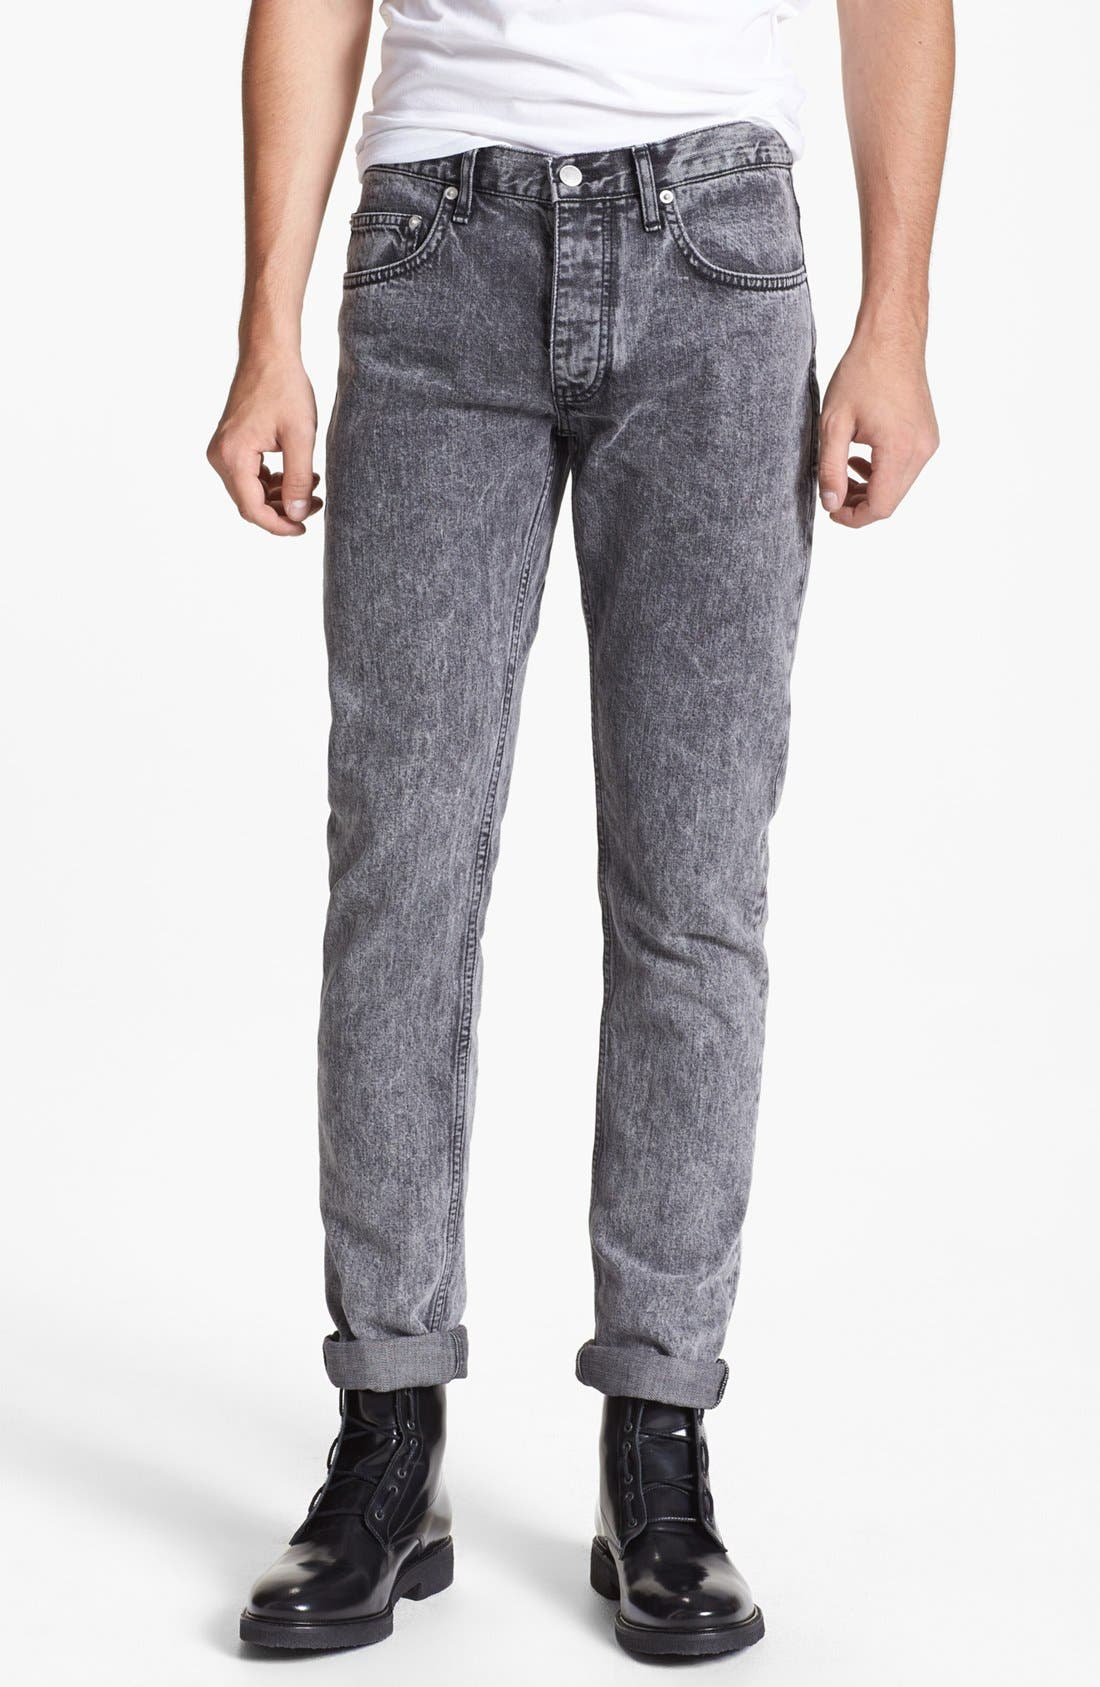 Alternate Image 1 Selected - sandro 'Pixies' Straight Leg Jeans